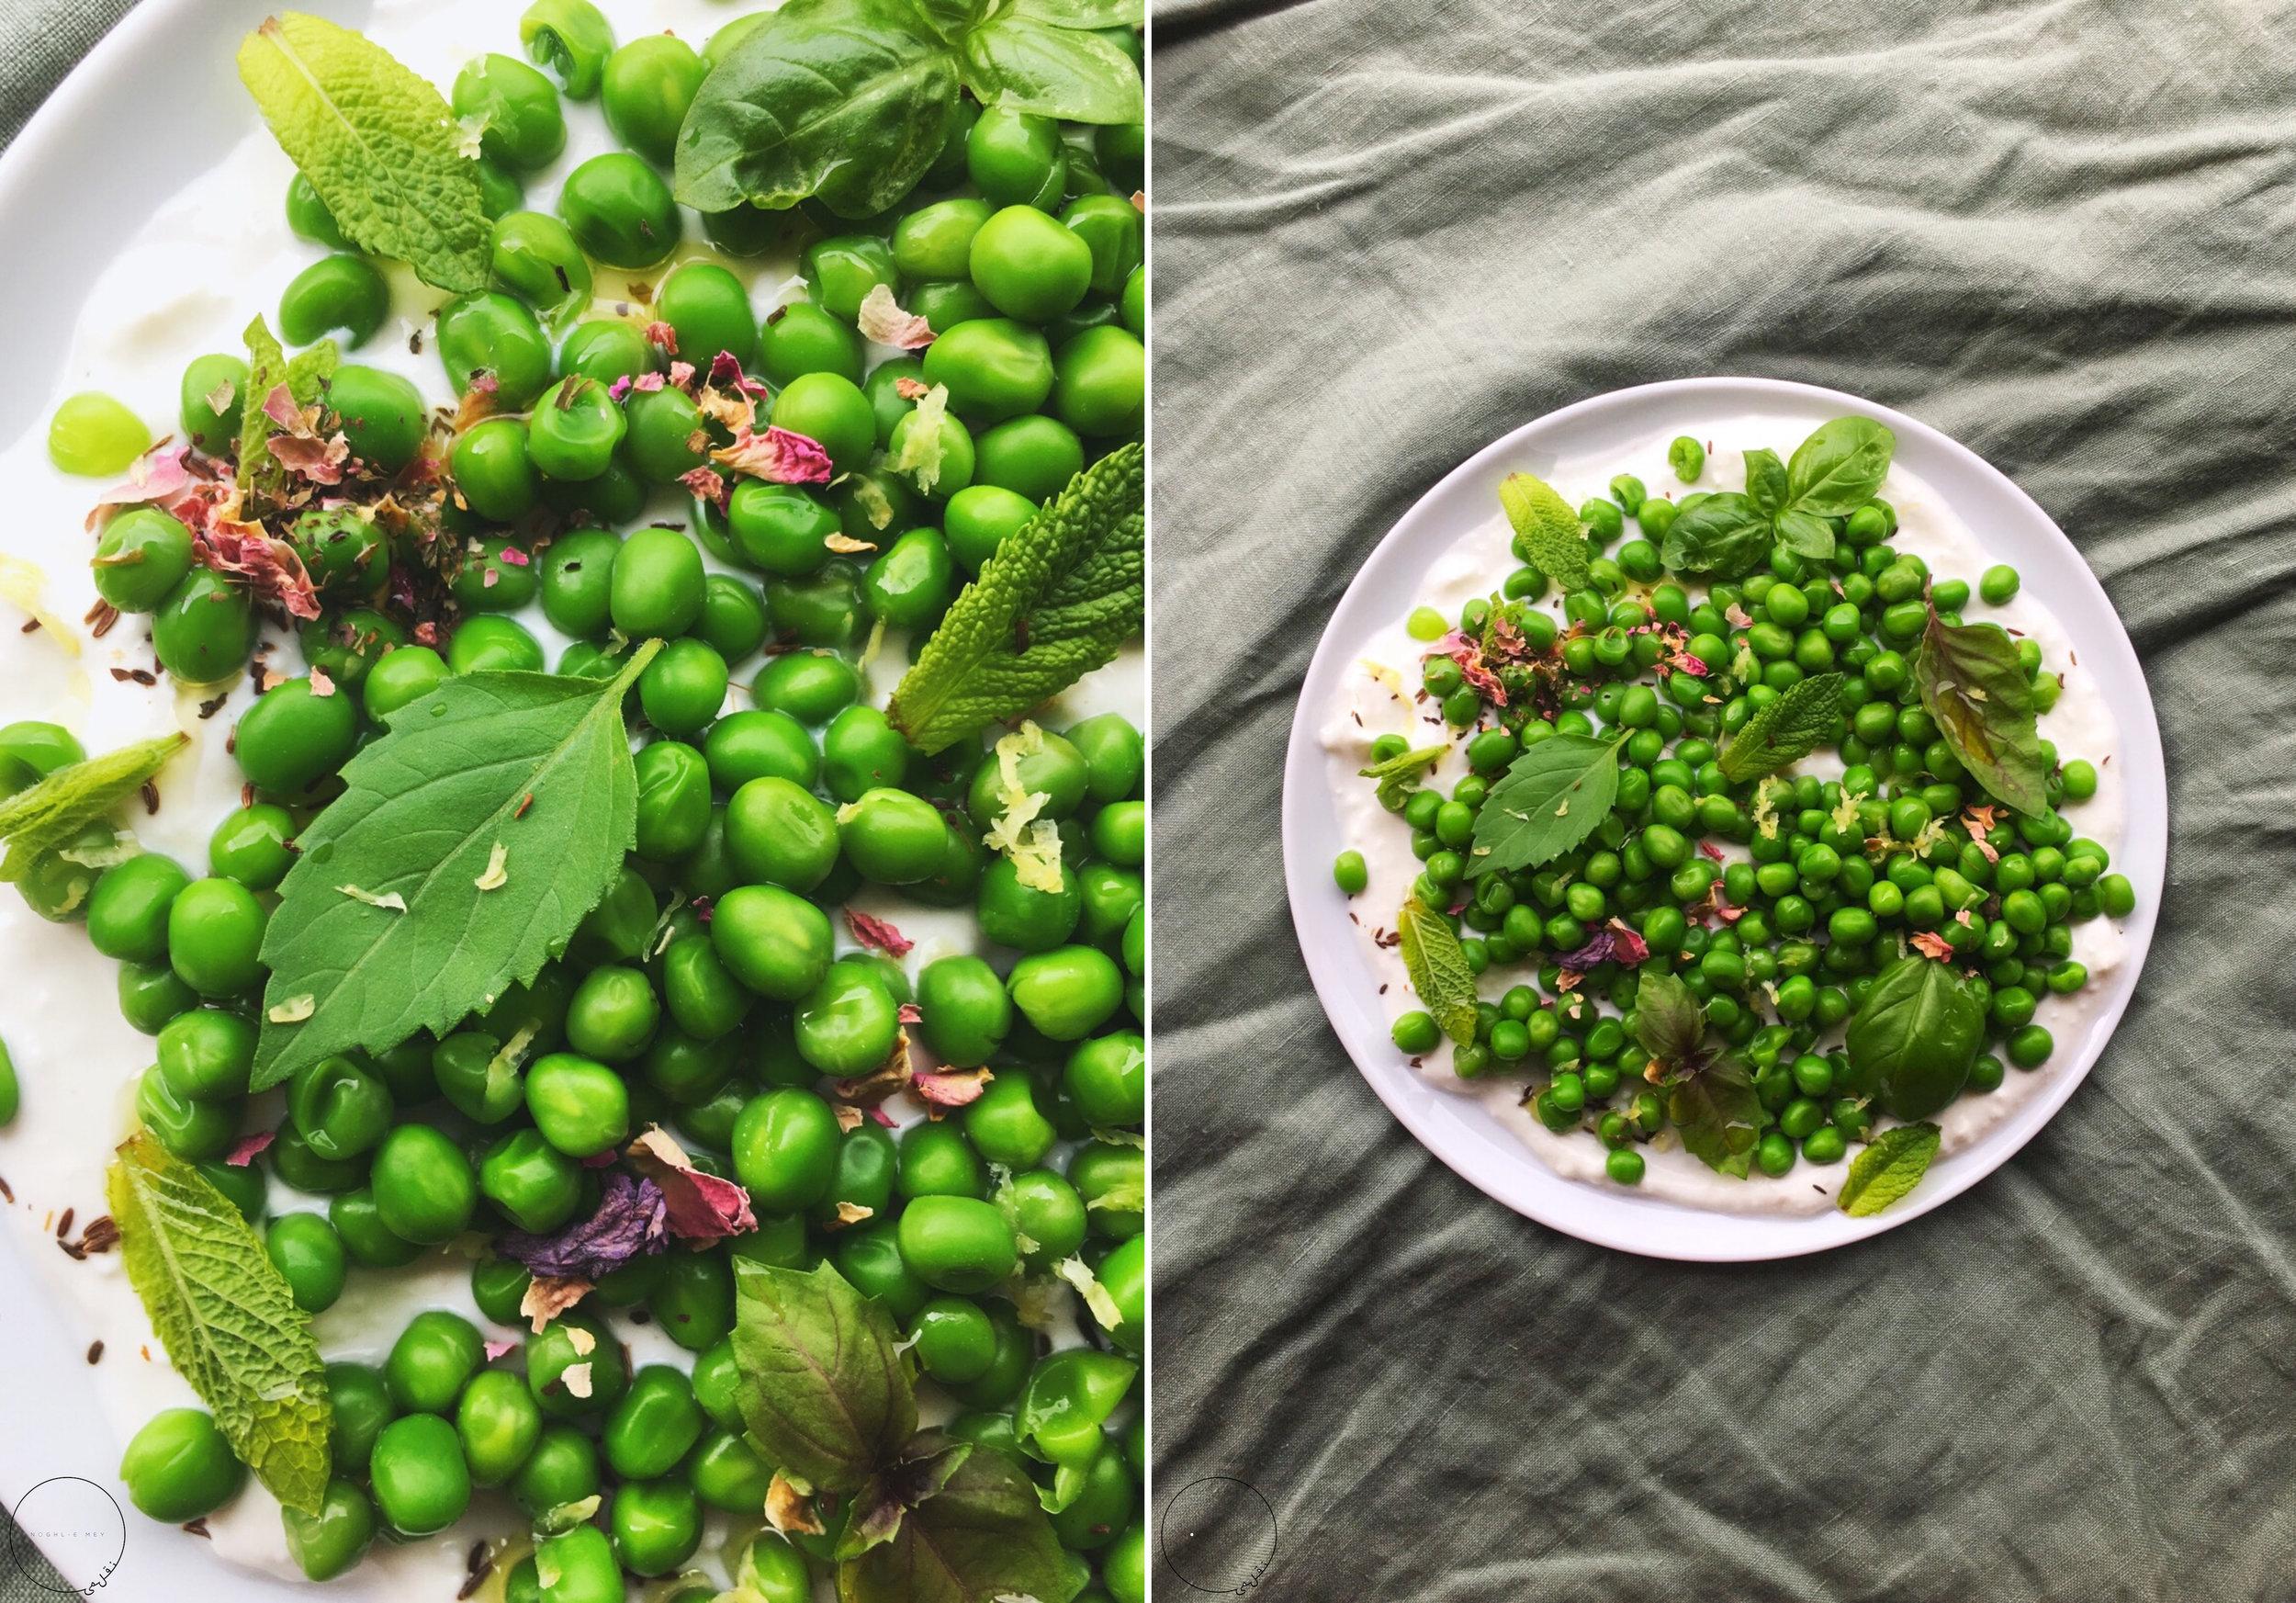 peas-herbs-yogurt-noghlemey-7.jpg